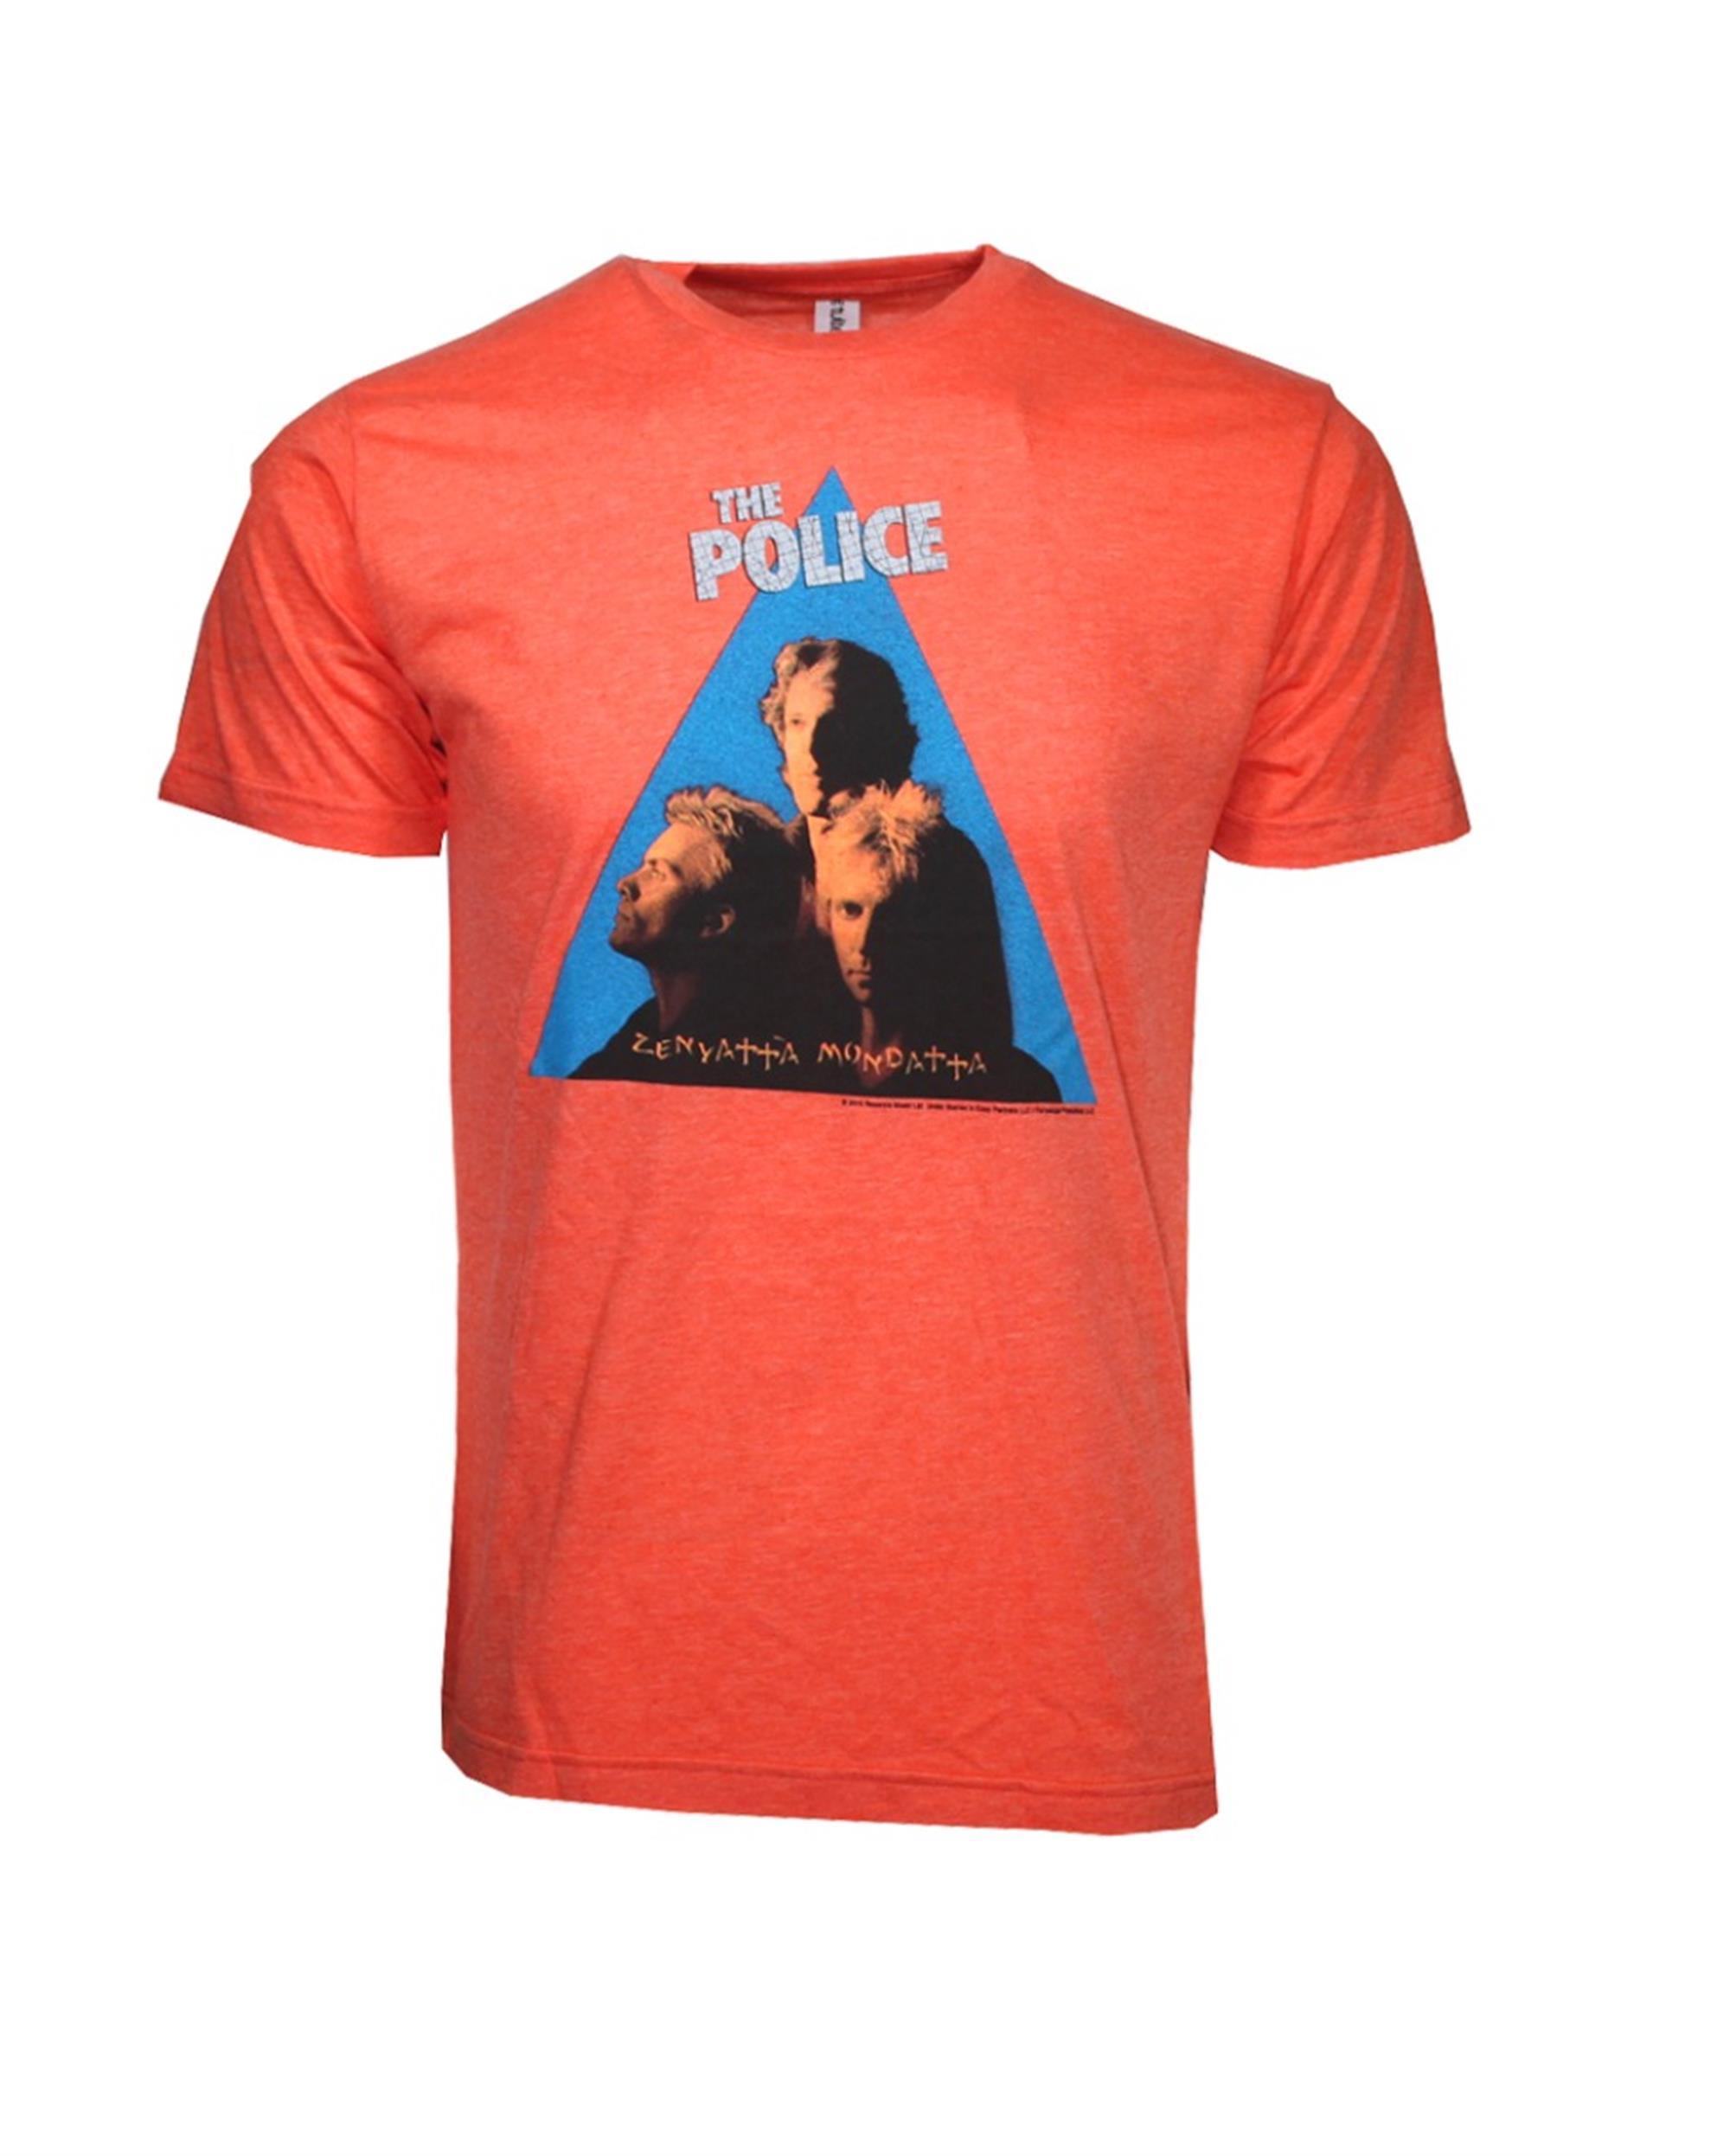 The Police Zenyatta Mondatta T-Shirt